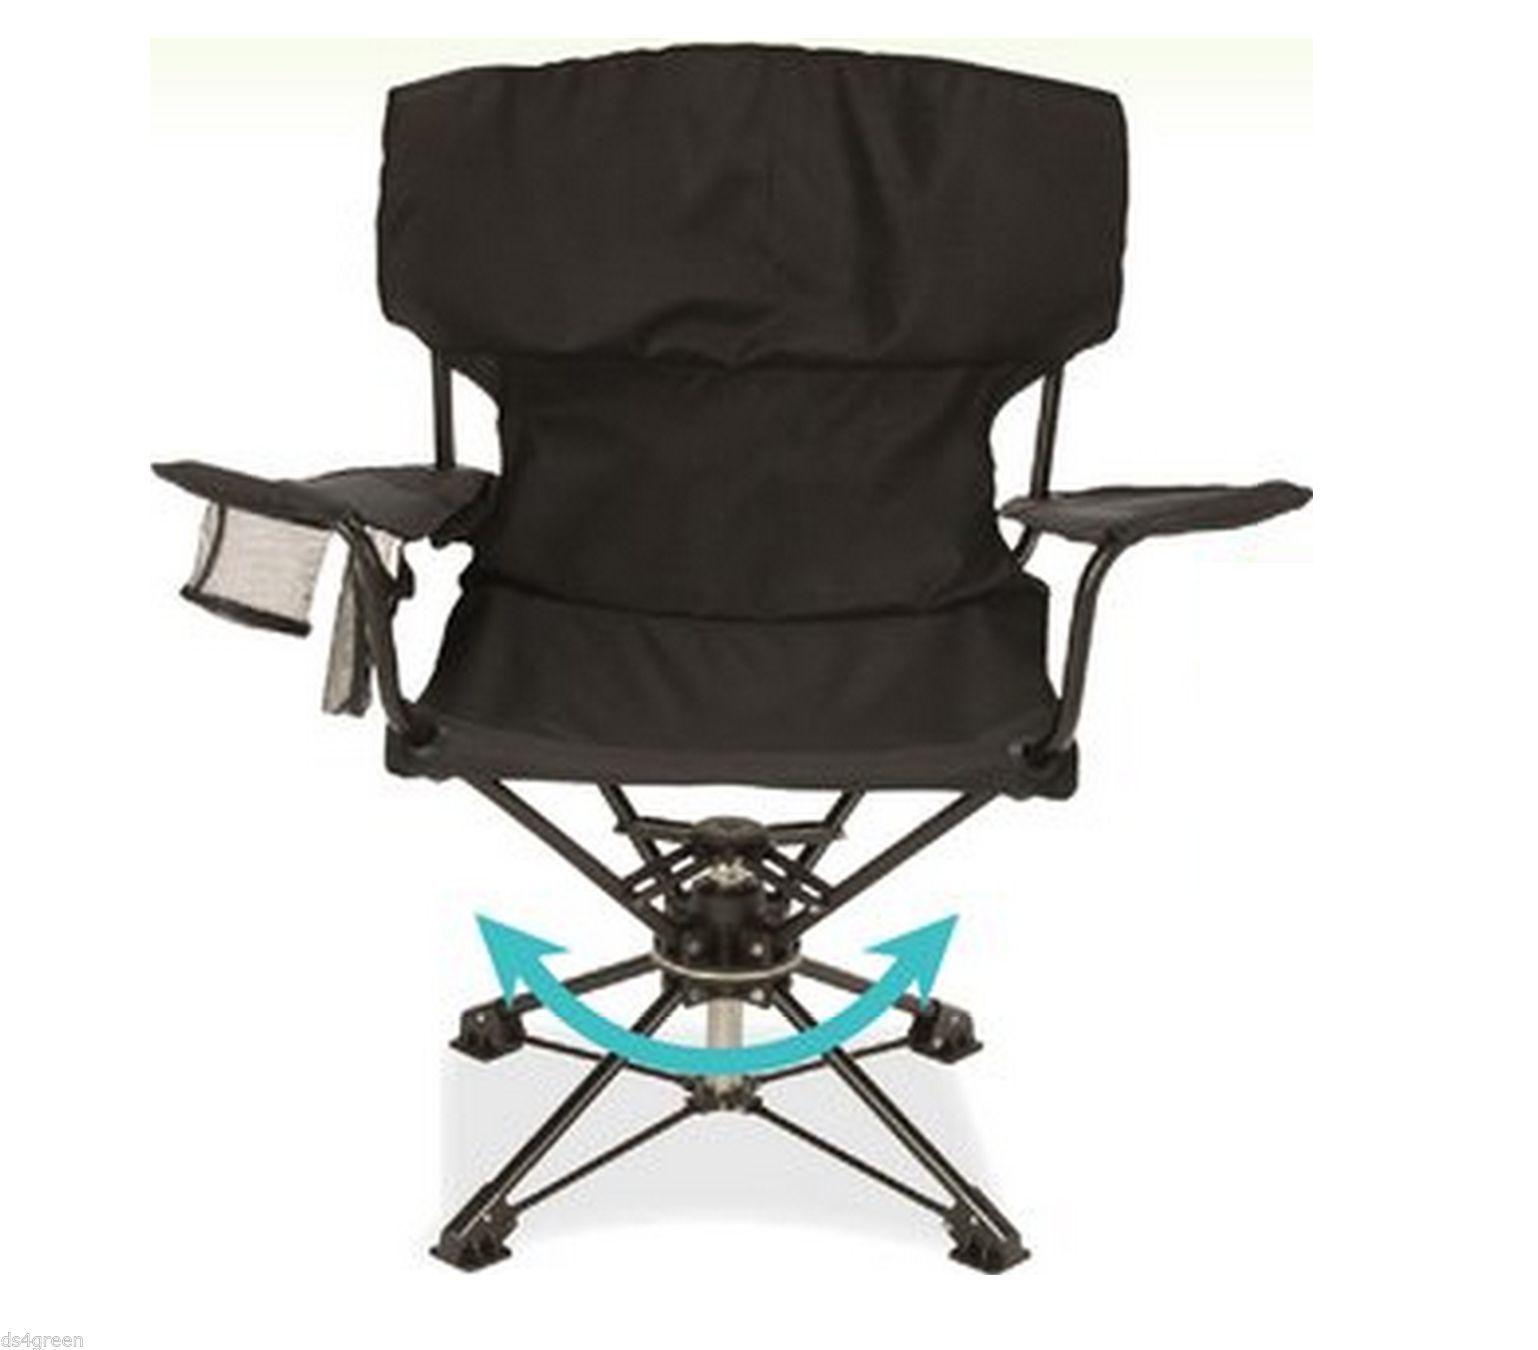 Revolve Patio Pool Camp Folding Portable Tailgateing Quad